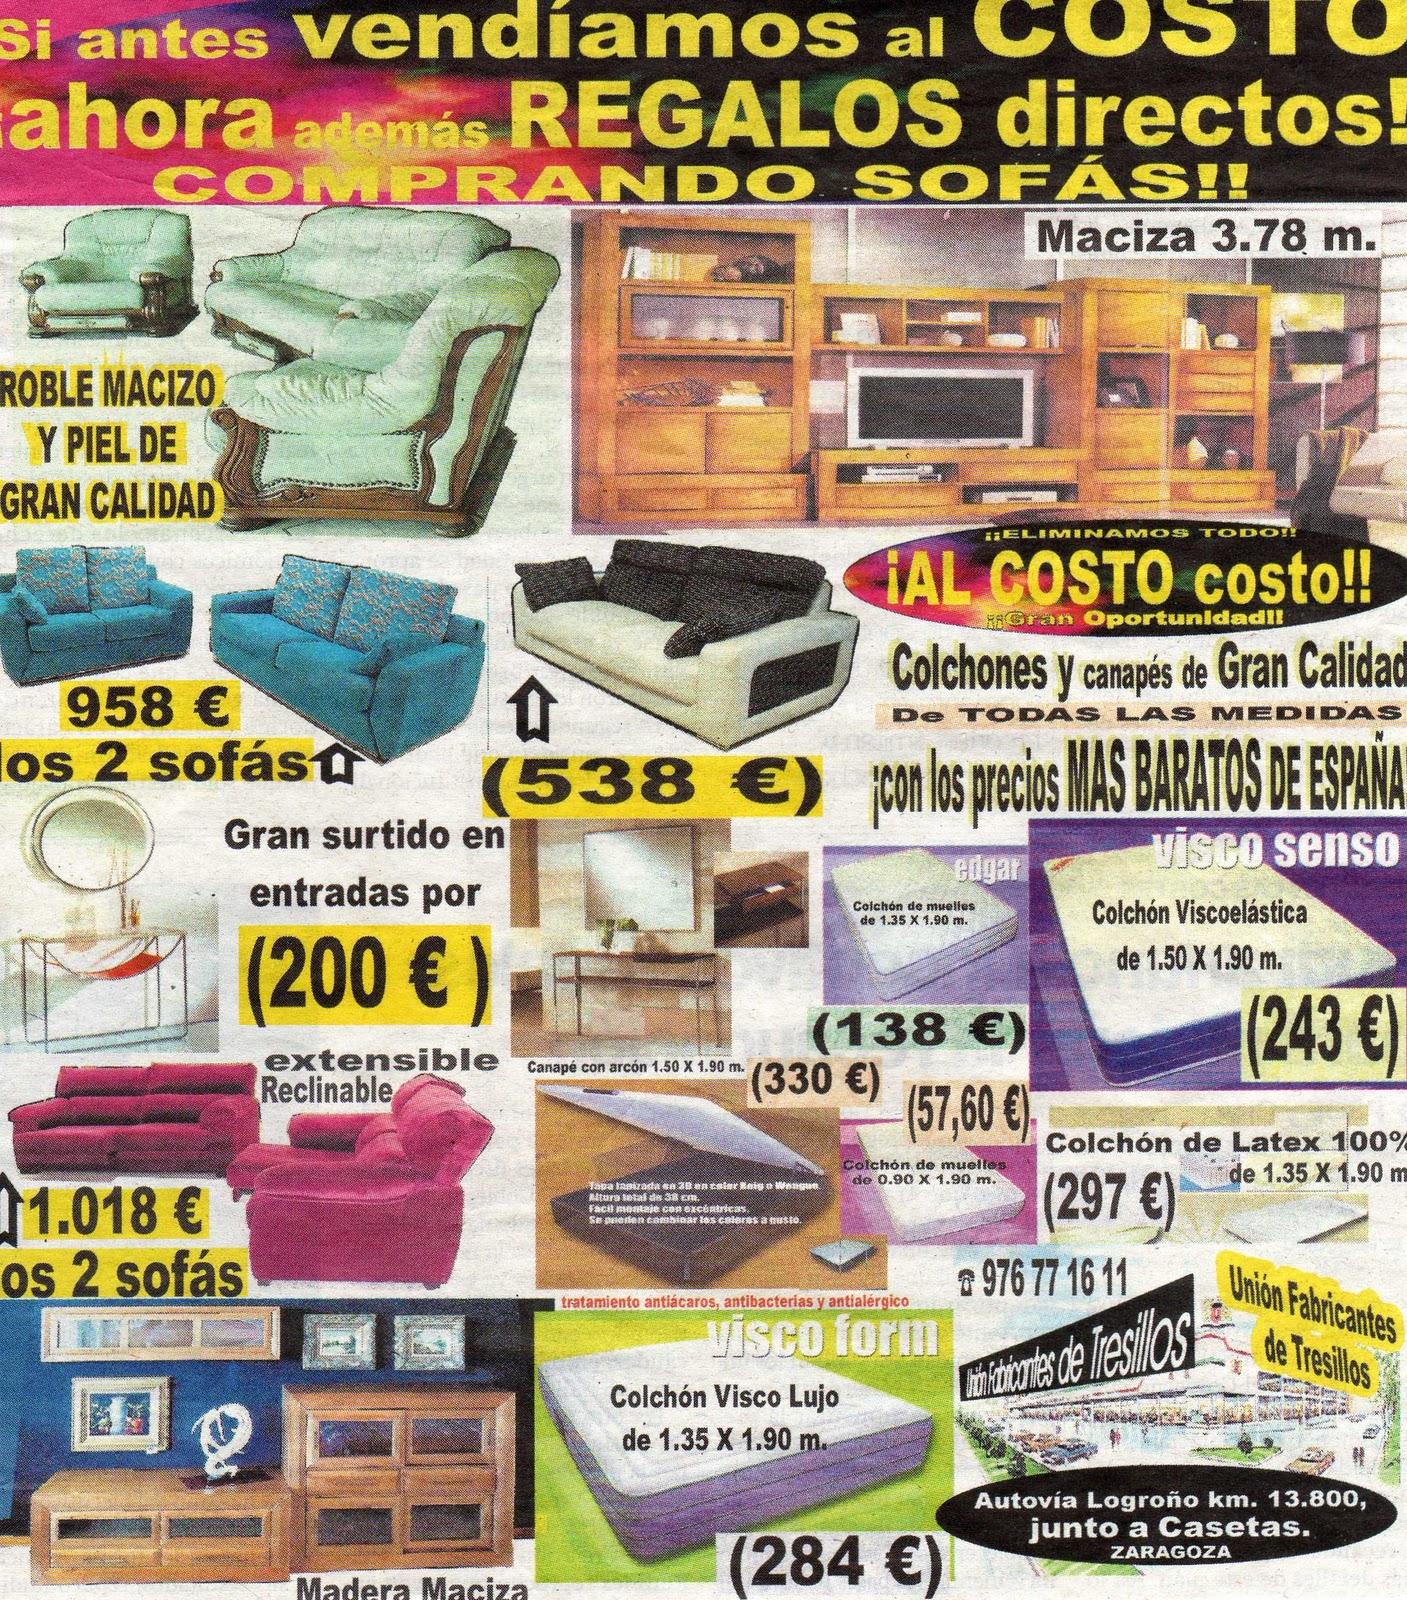 Uni n fabricantes de tresillos octubre 2011 for Tresillos economicos